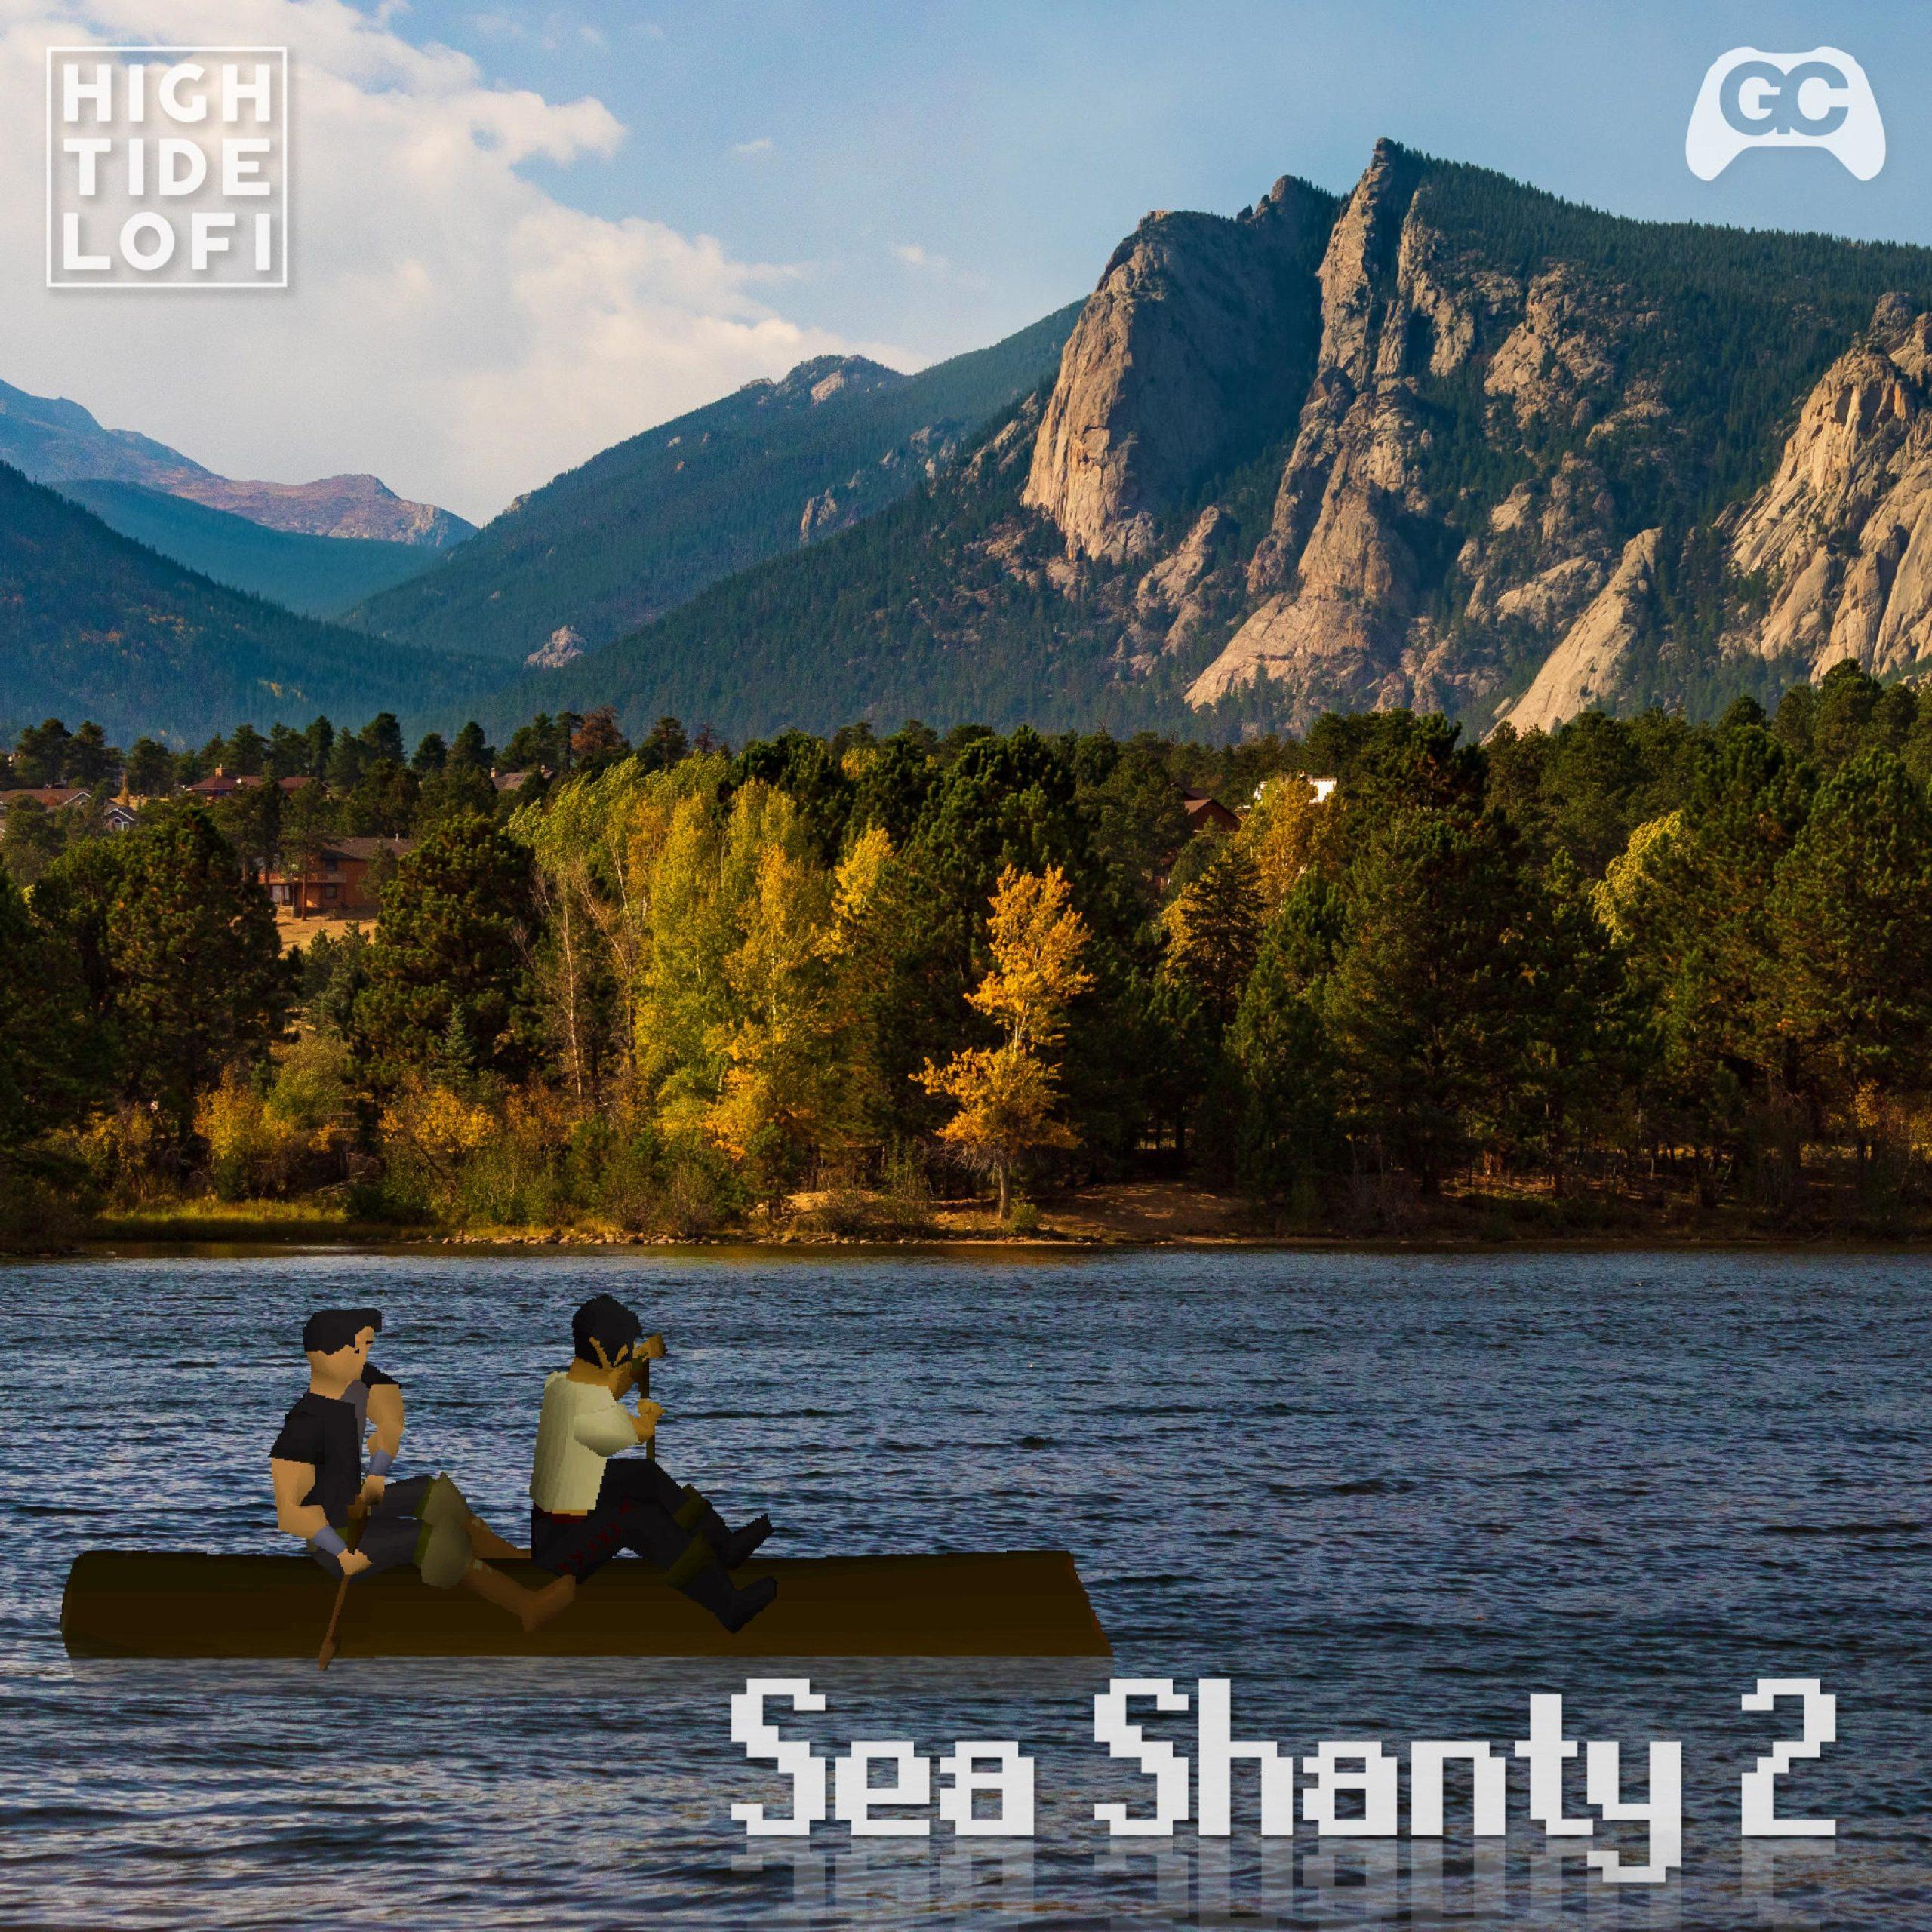 Sea Shanty 2 – High Tide Lofi